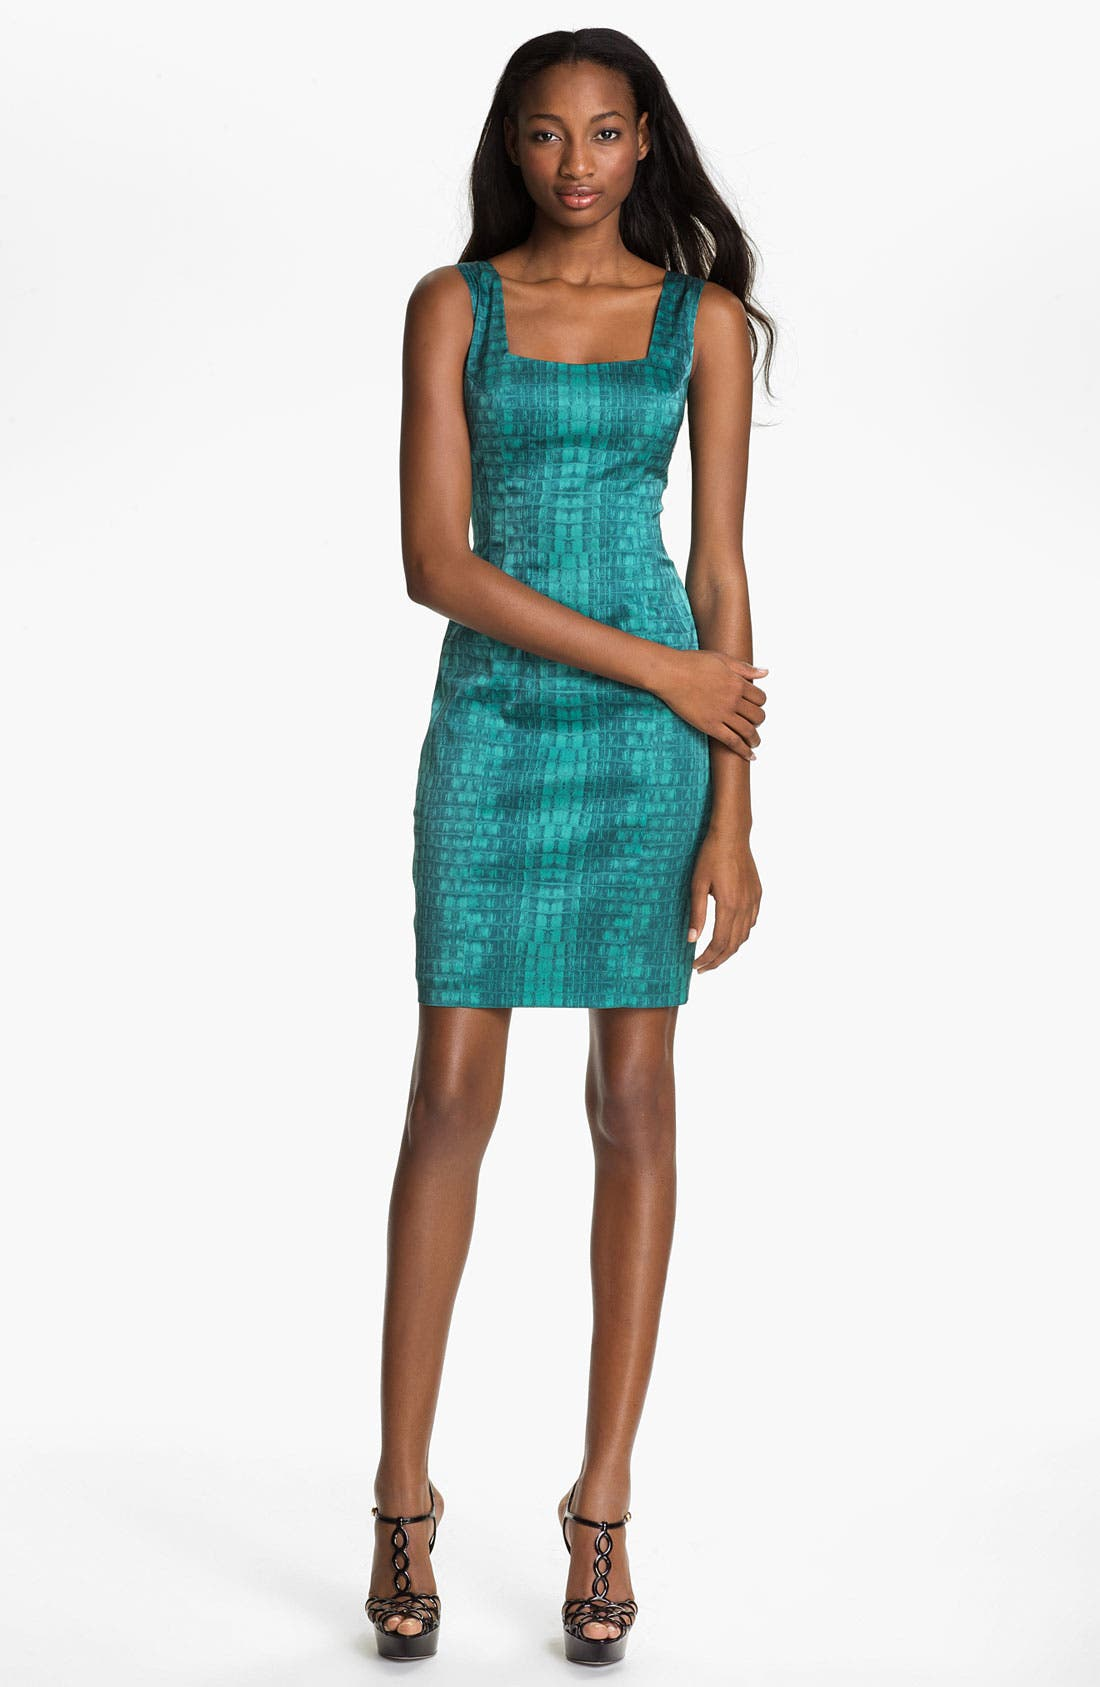 Alternate Image 1 Selected - Jay Godfrey 'Balti' Alligator Print Dress (Nordstrom Exclusive)